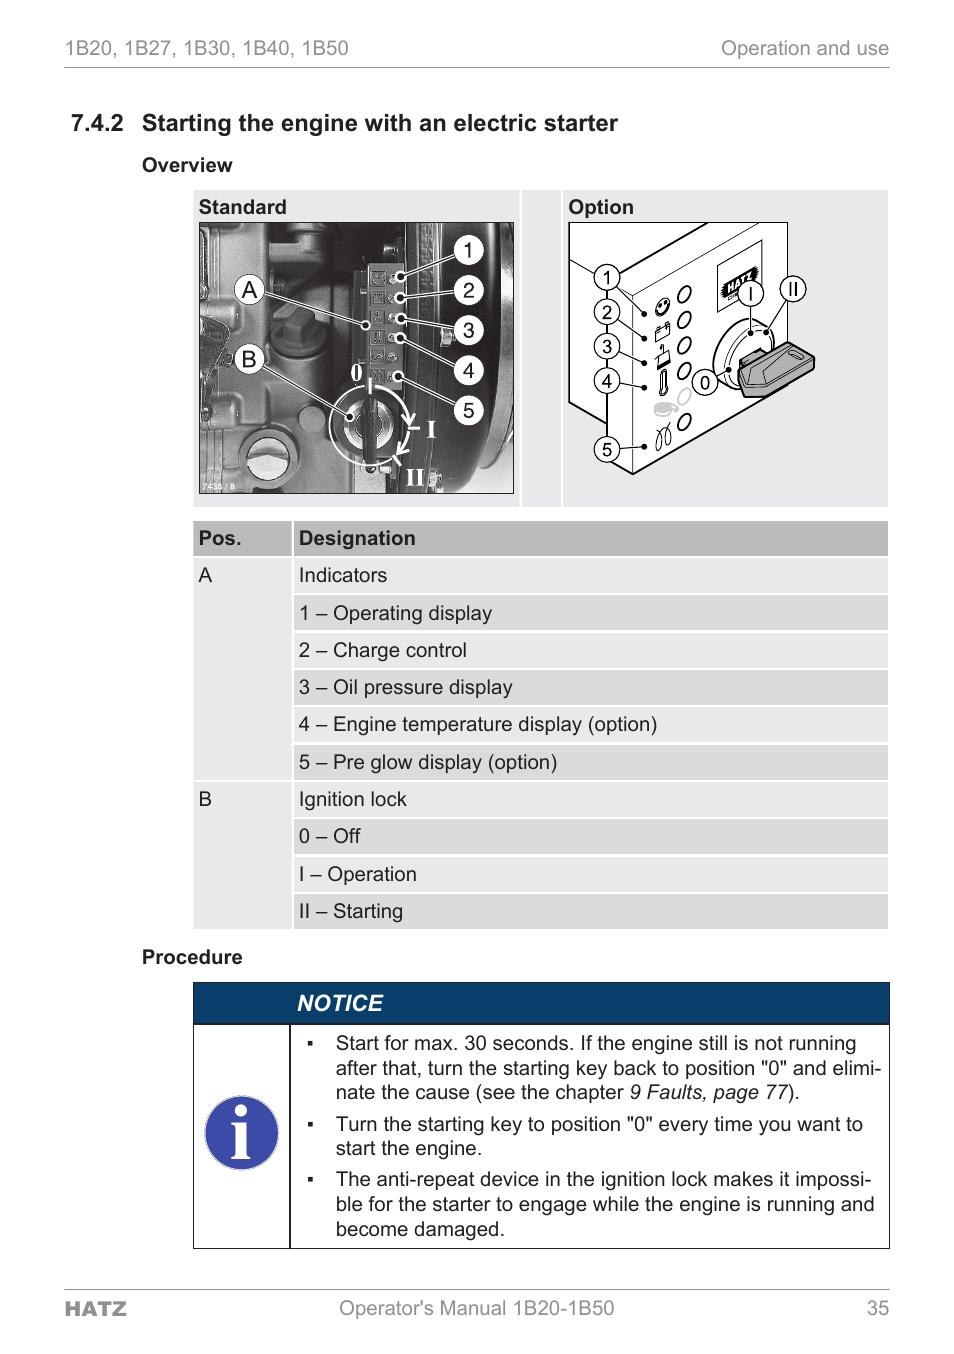 Hatz Diesel Motor 1b20 1b30 1b40 Manual del operador